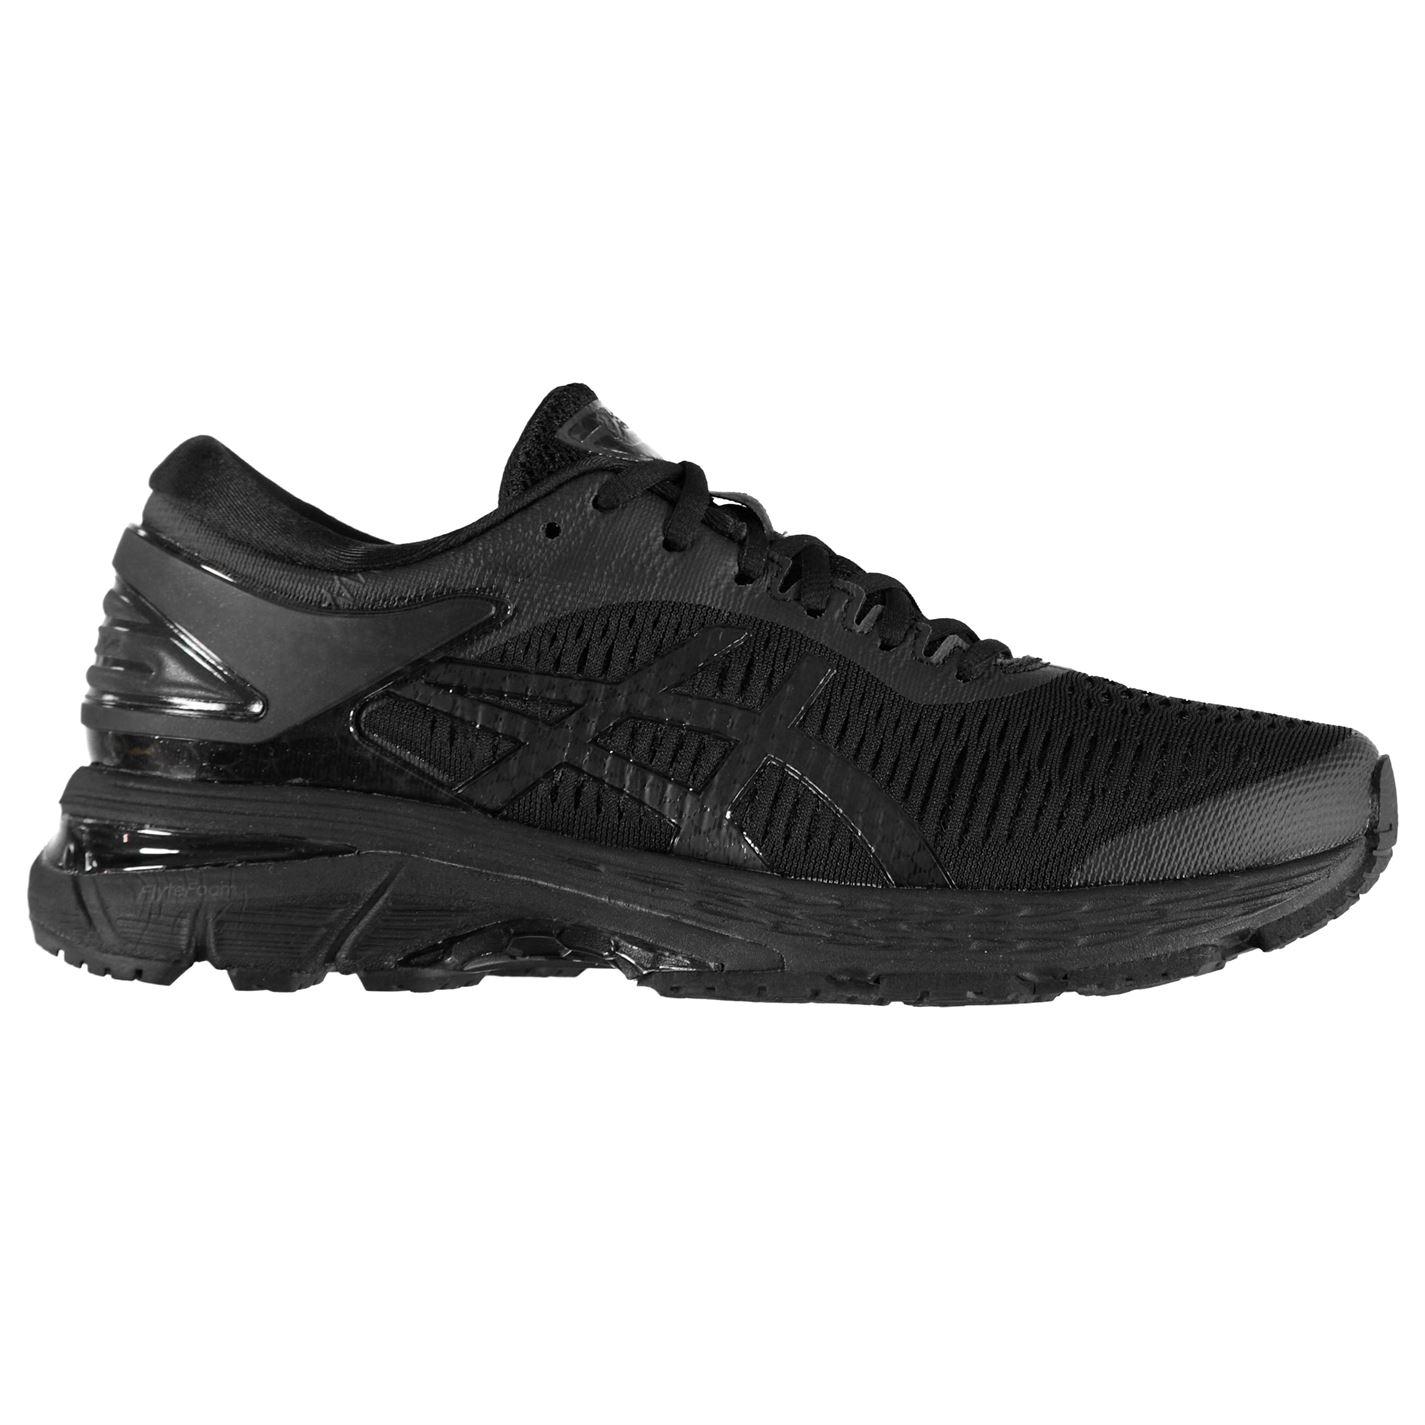 Bežecké tenisky Asics Gel Kayano 25 Ladies Running Shoes - Glami.sk 40ebbd4b8fc